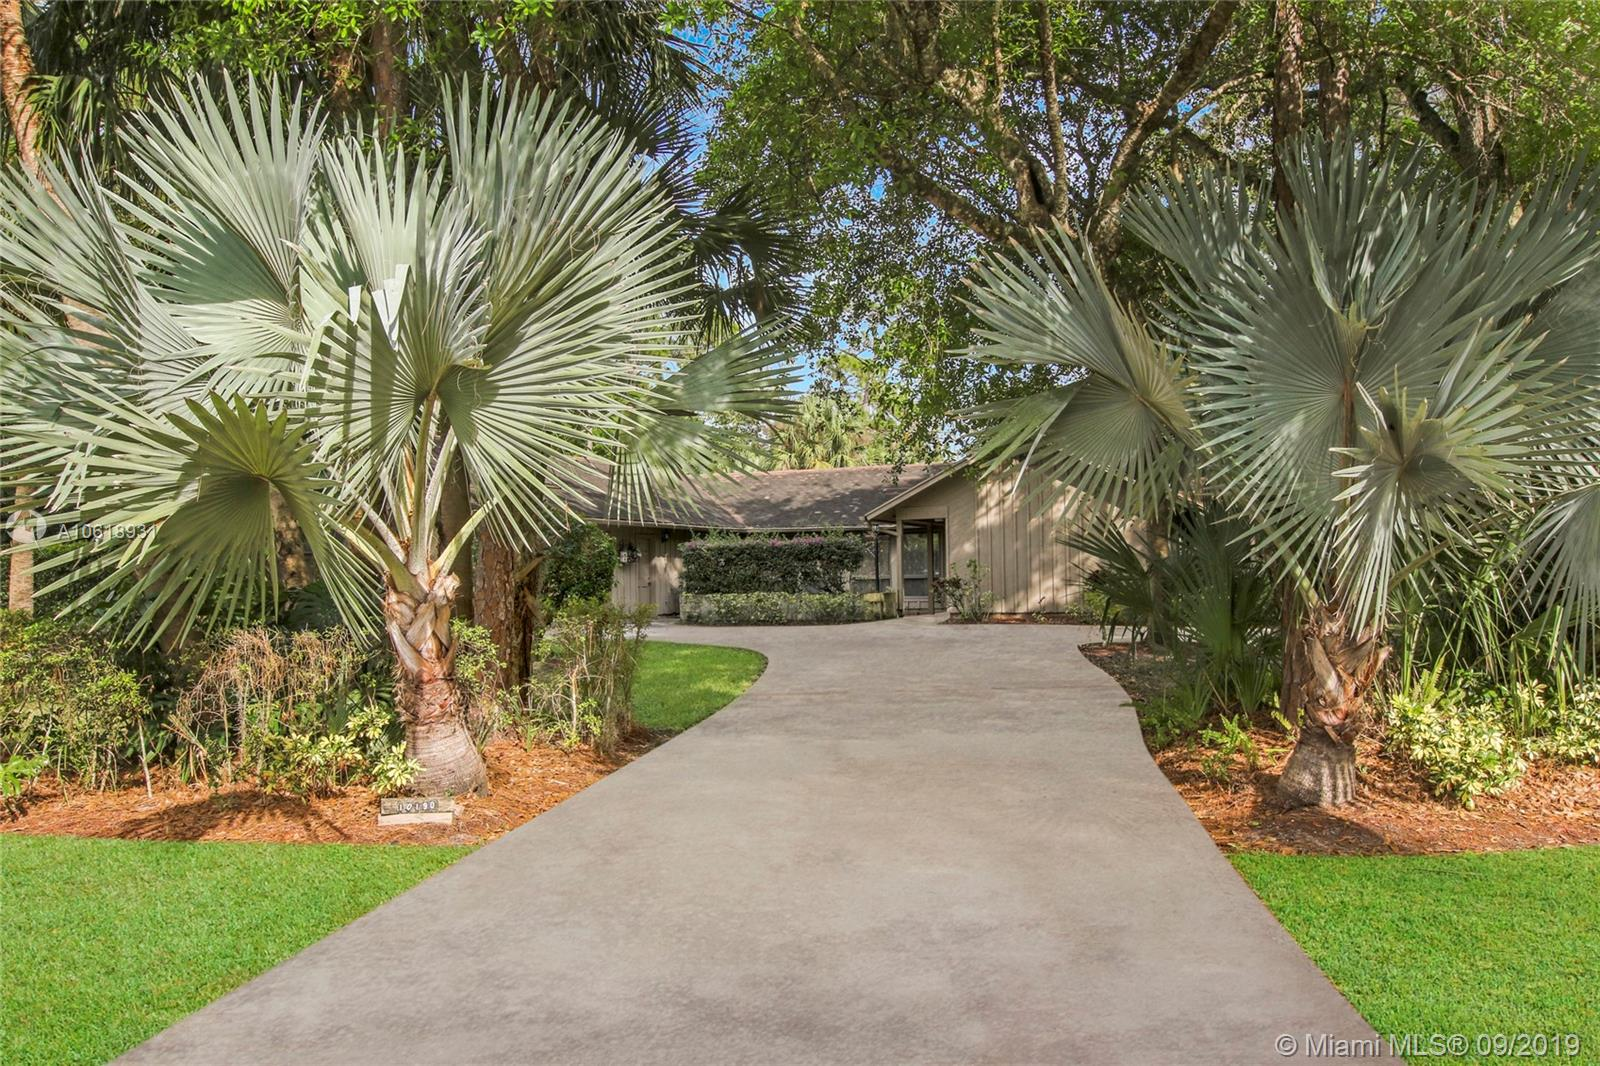 10190 W Trailwood Cir - Jupiter, Florida